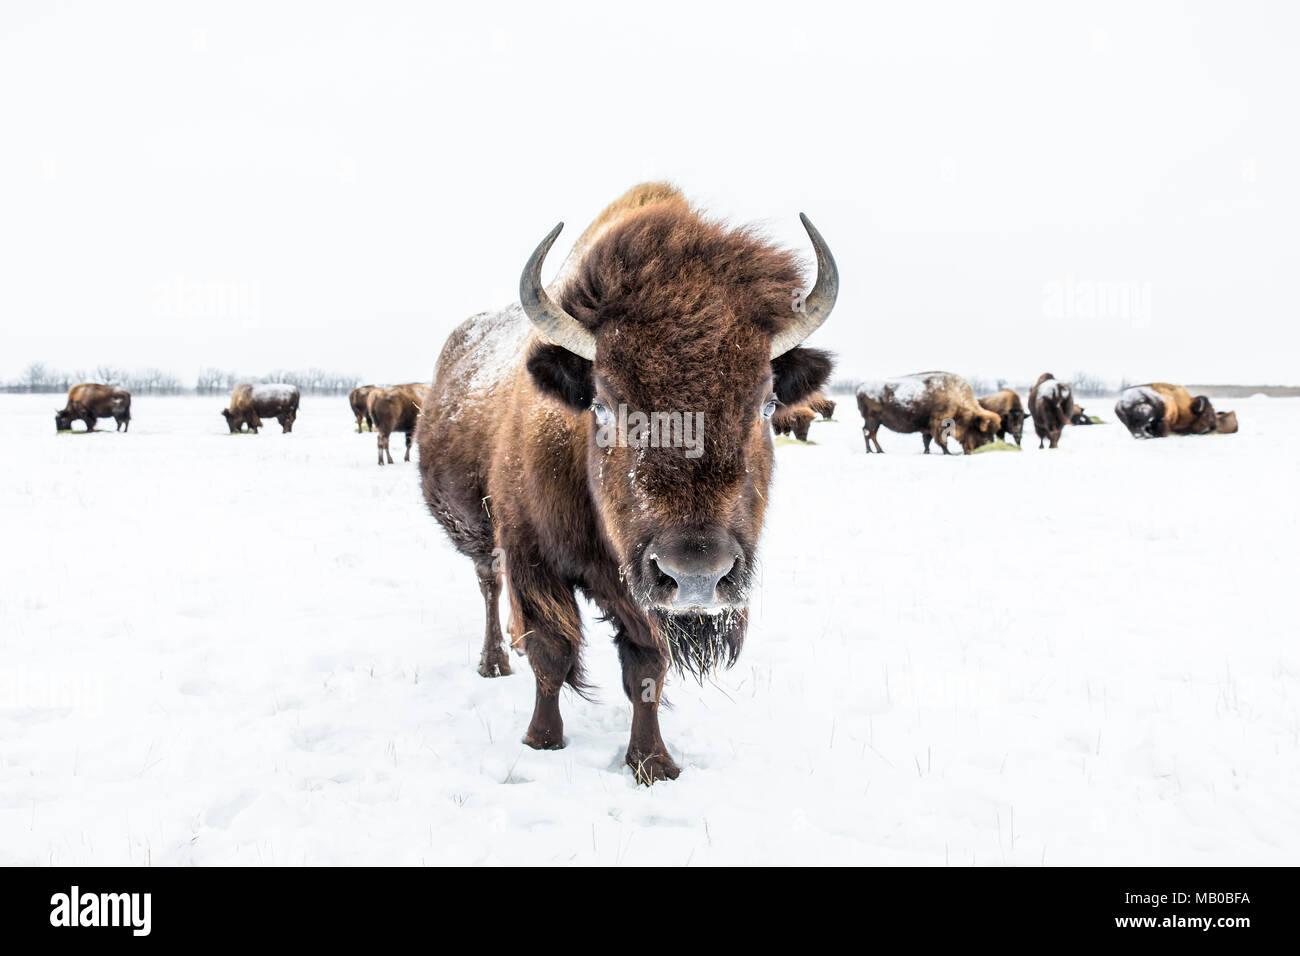 Herde der Plains Bisons (Bison bison Bison) oder American Buffalo, im Winter, Manitoba, Kanada. Stockbild